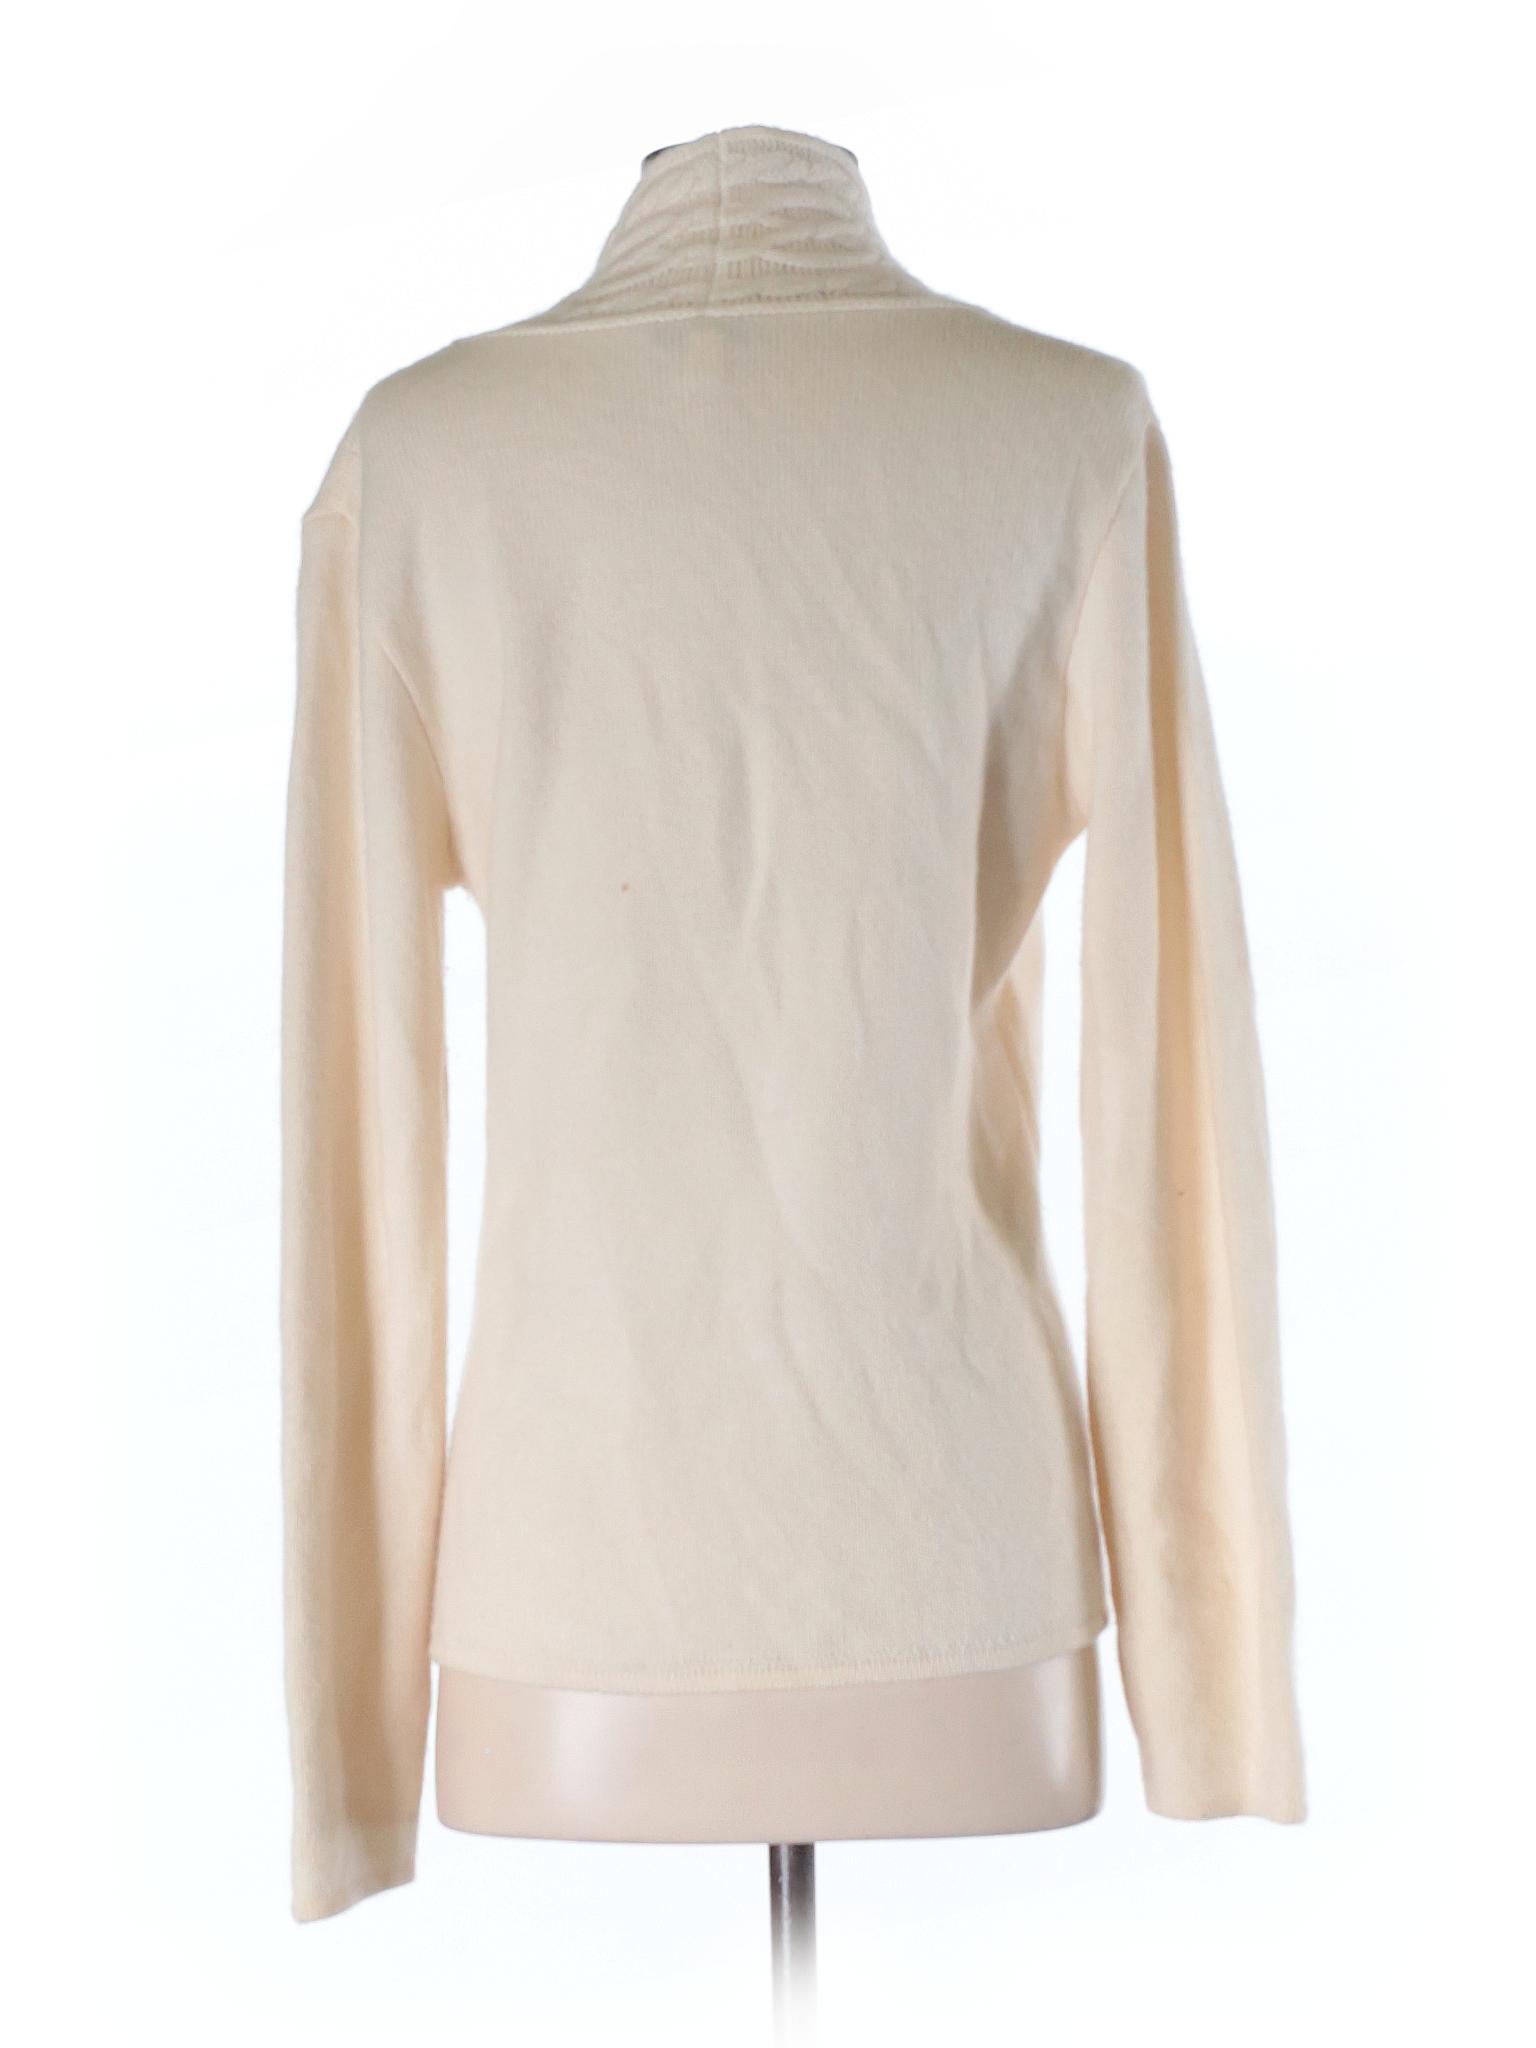 St Pullover Sport Sweater John Boutique w4vPqHqU